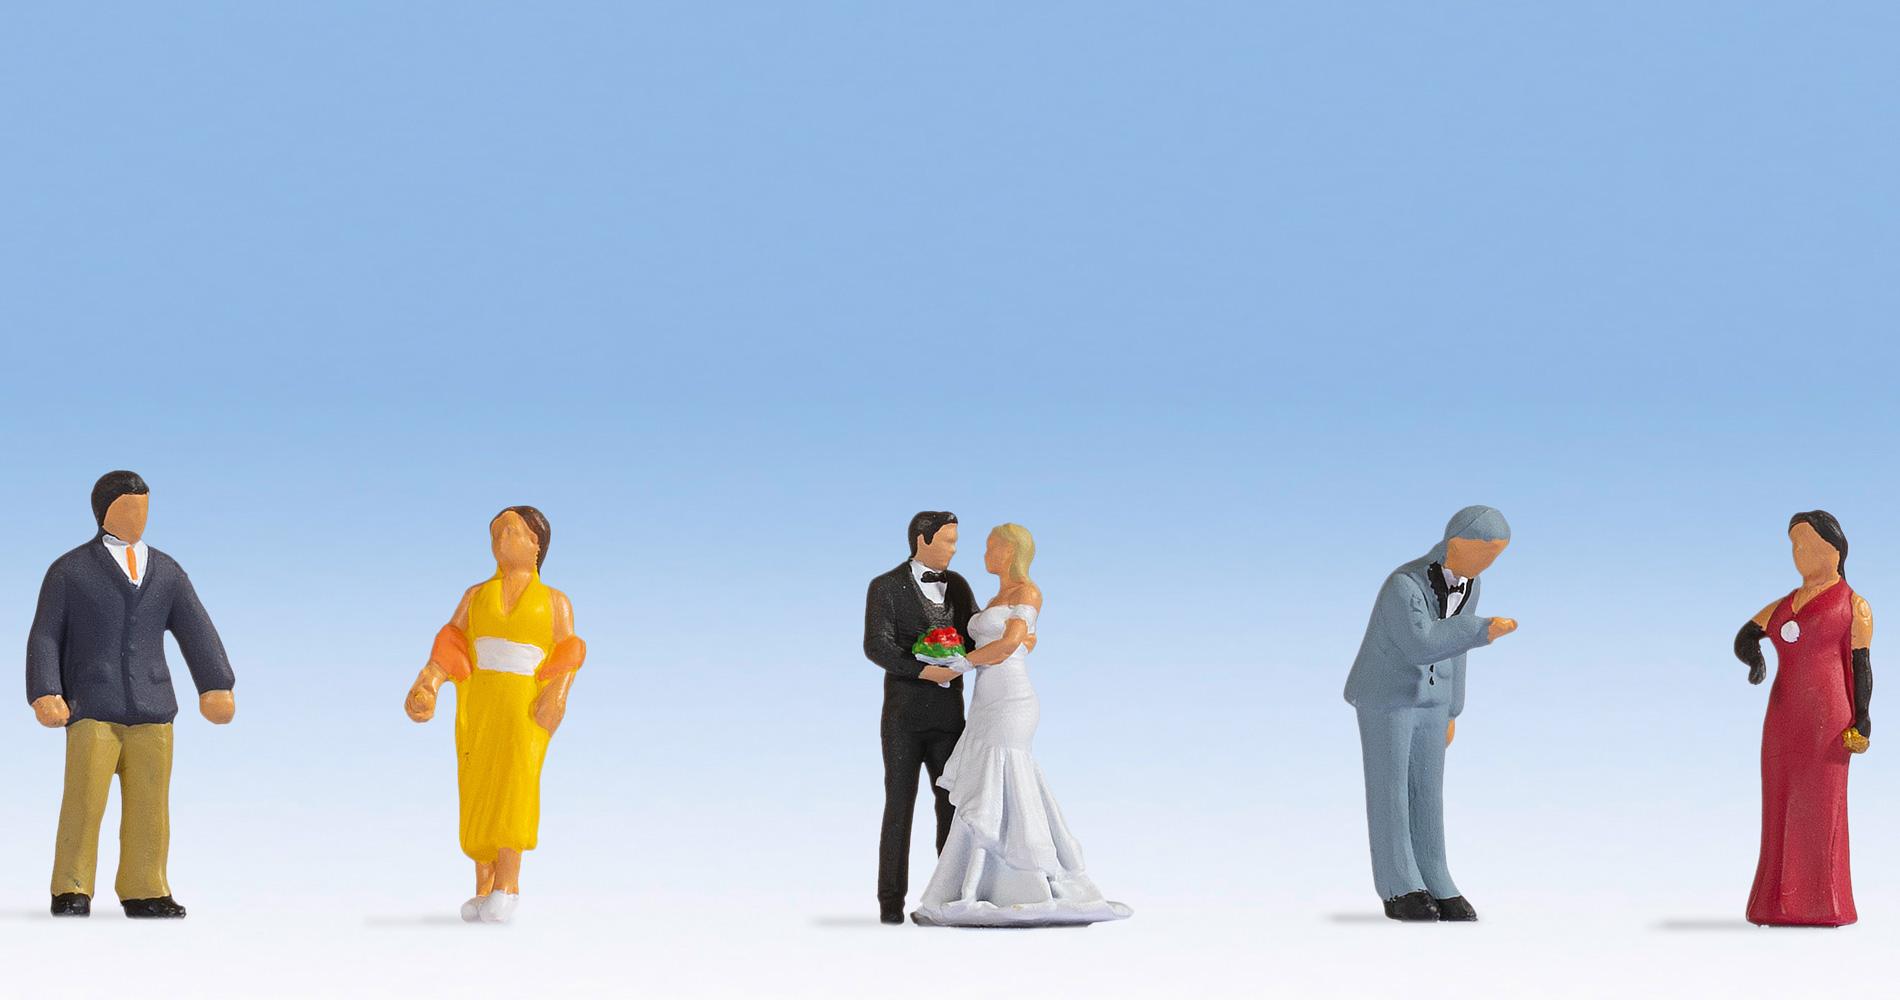 Encore 12861 mariage h0